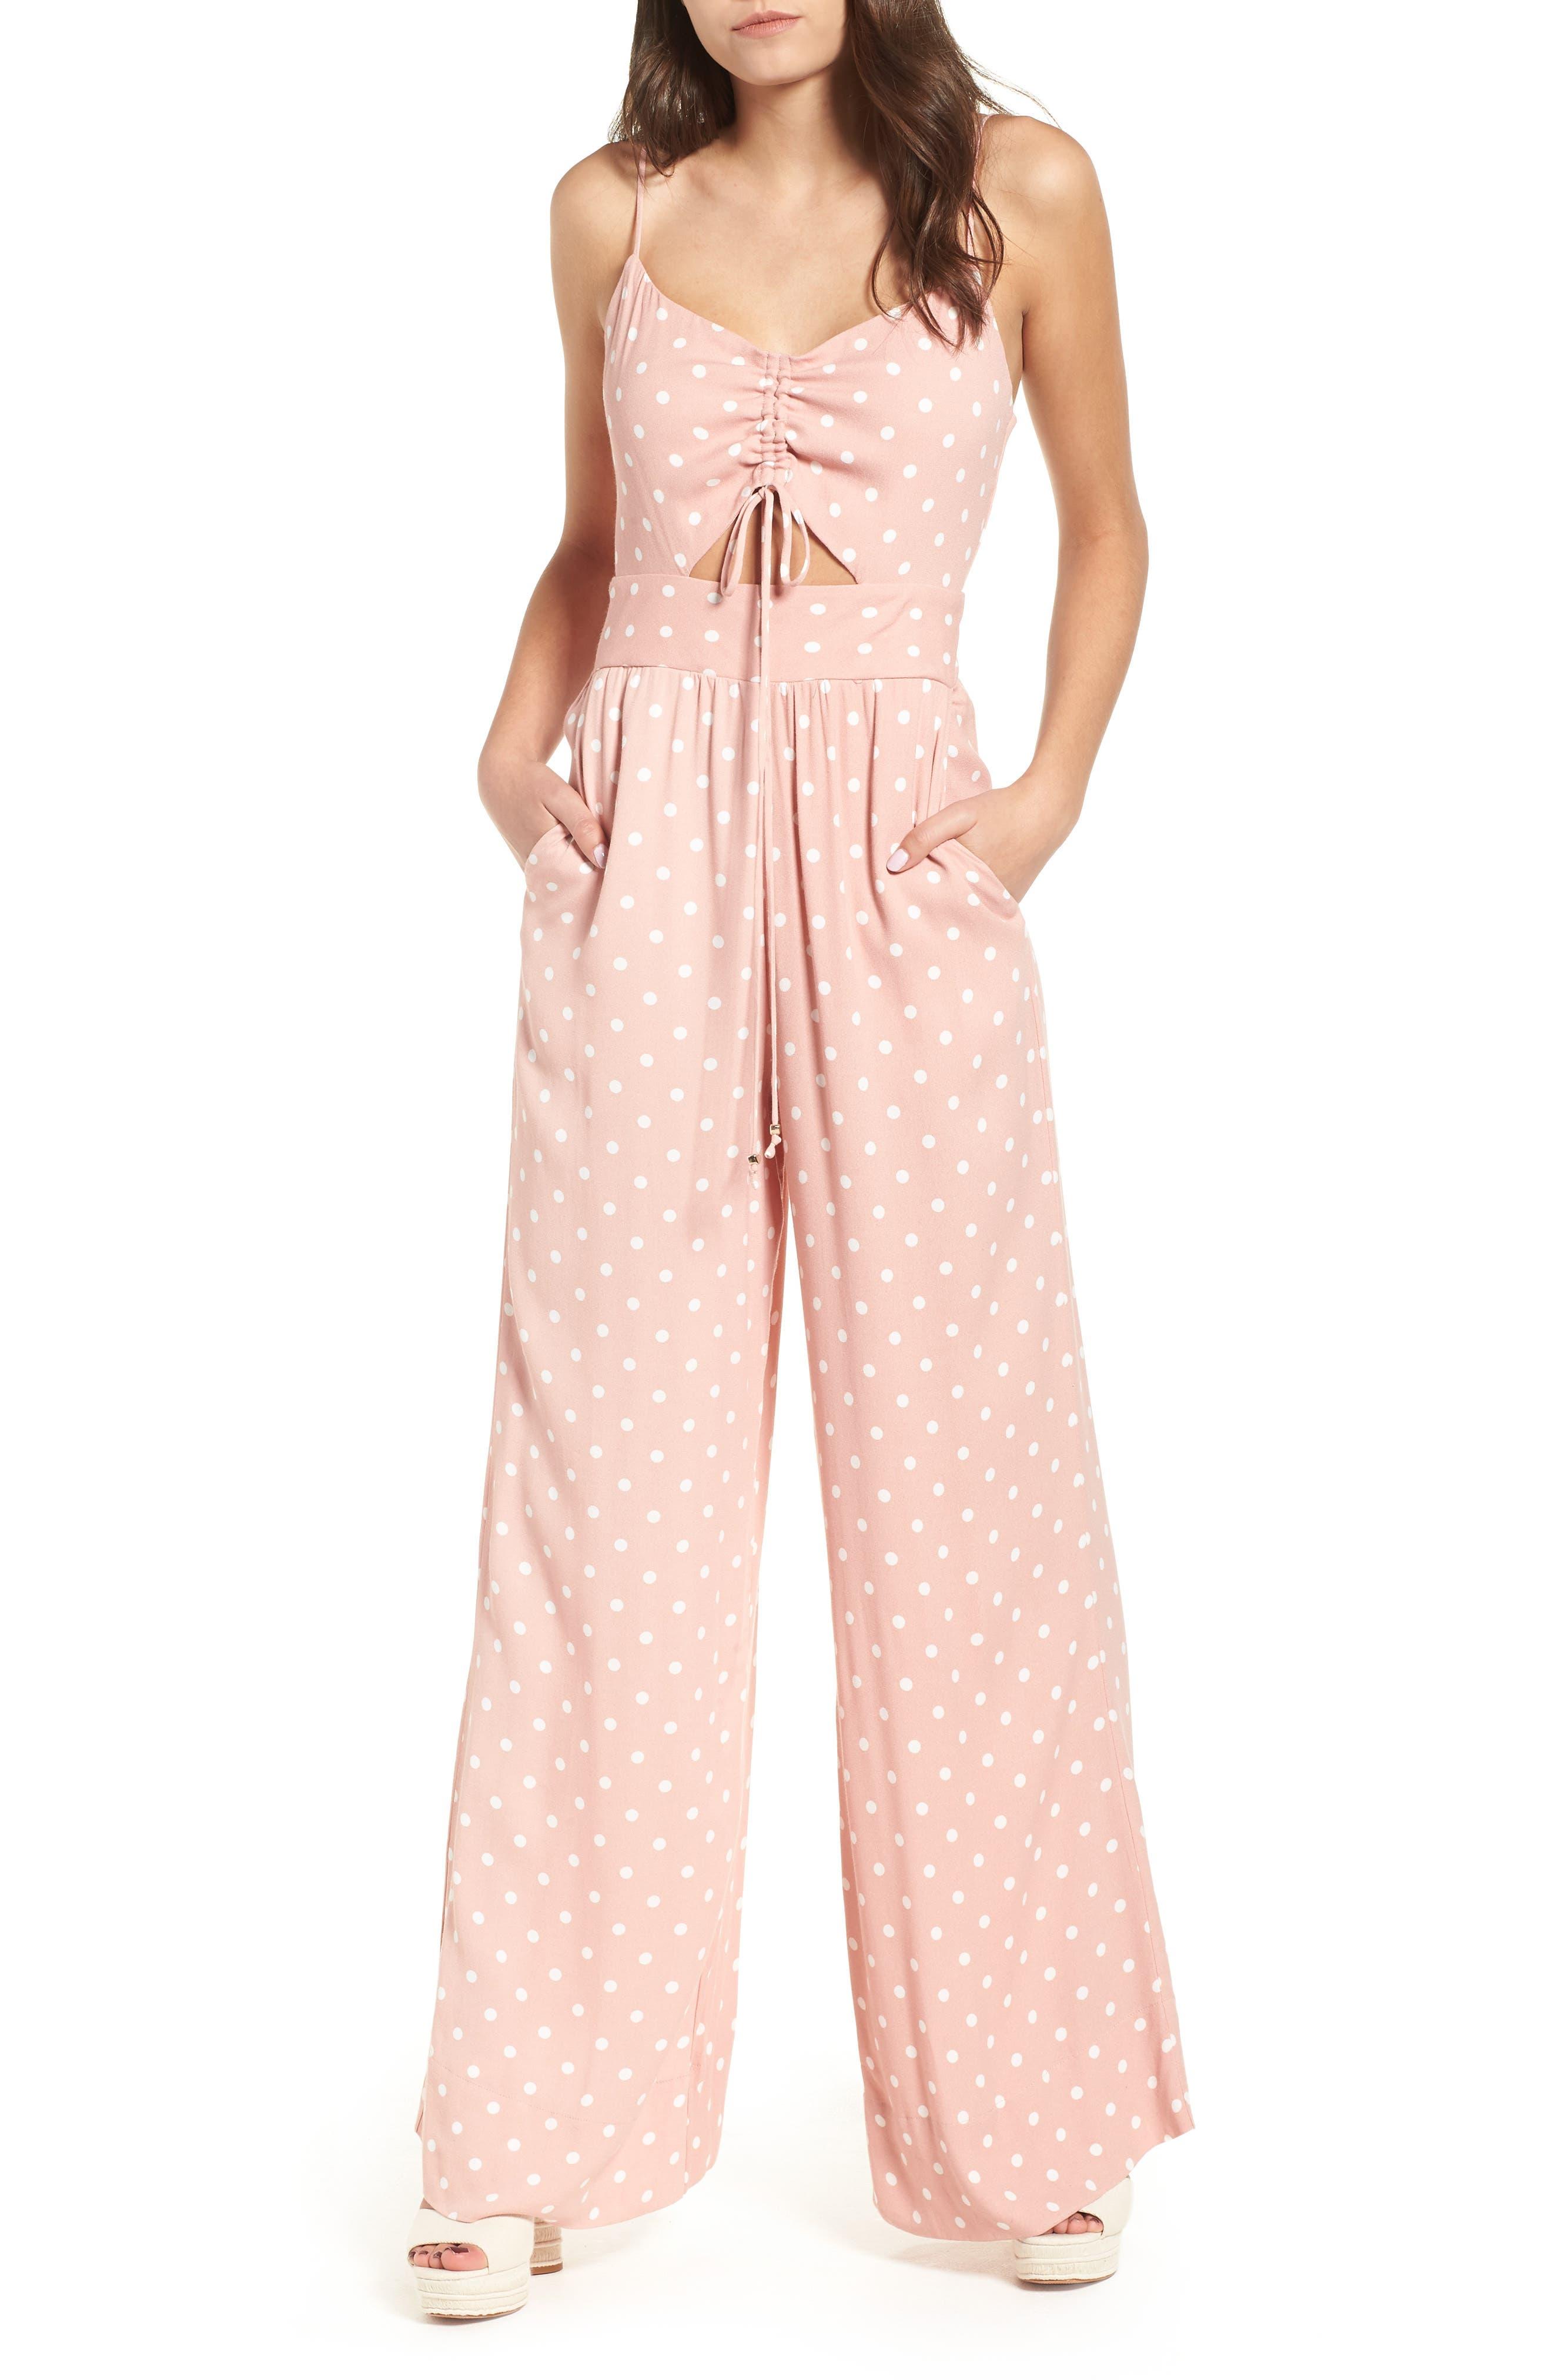 Milan Tie Front Jumpsuit,                             Main thumbnail 1, color,                             Misty Rose Polka Dot